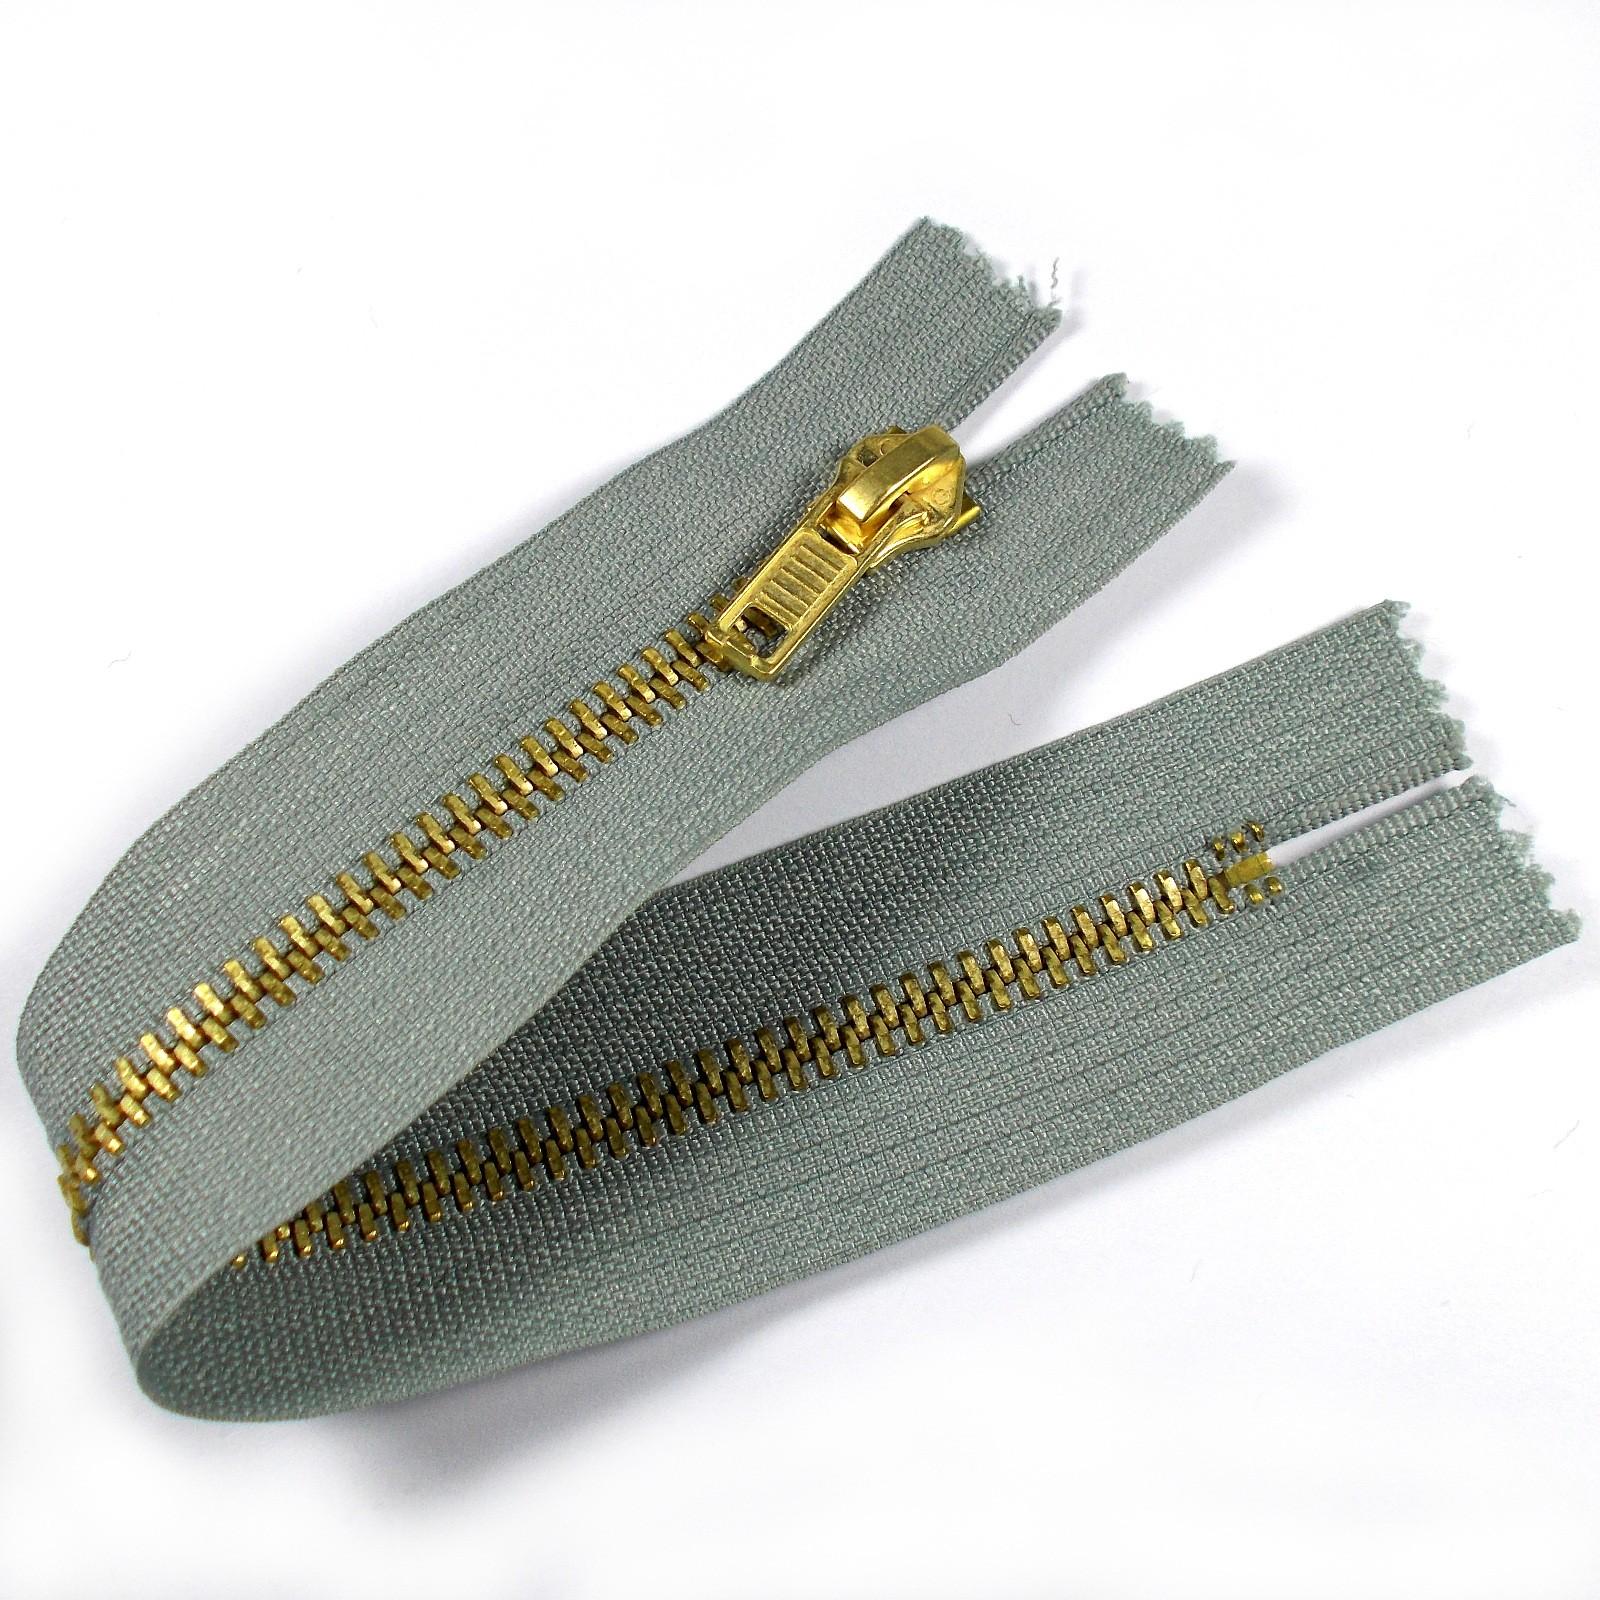 Gold Metal Trouser Jeans Zip Zipper 7 inch Grey